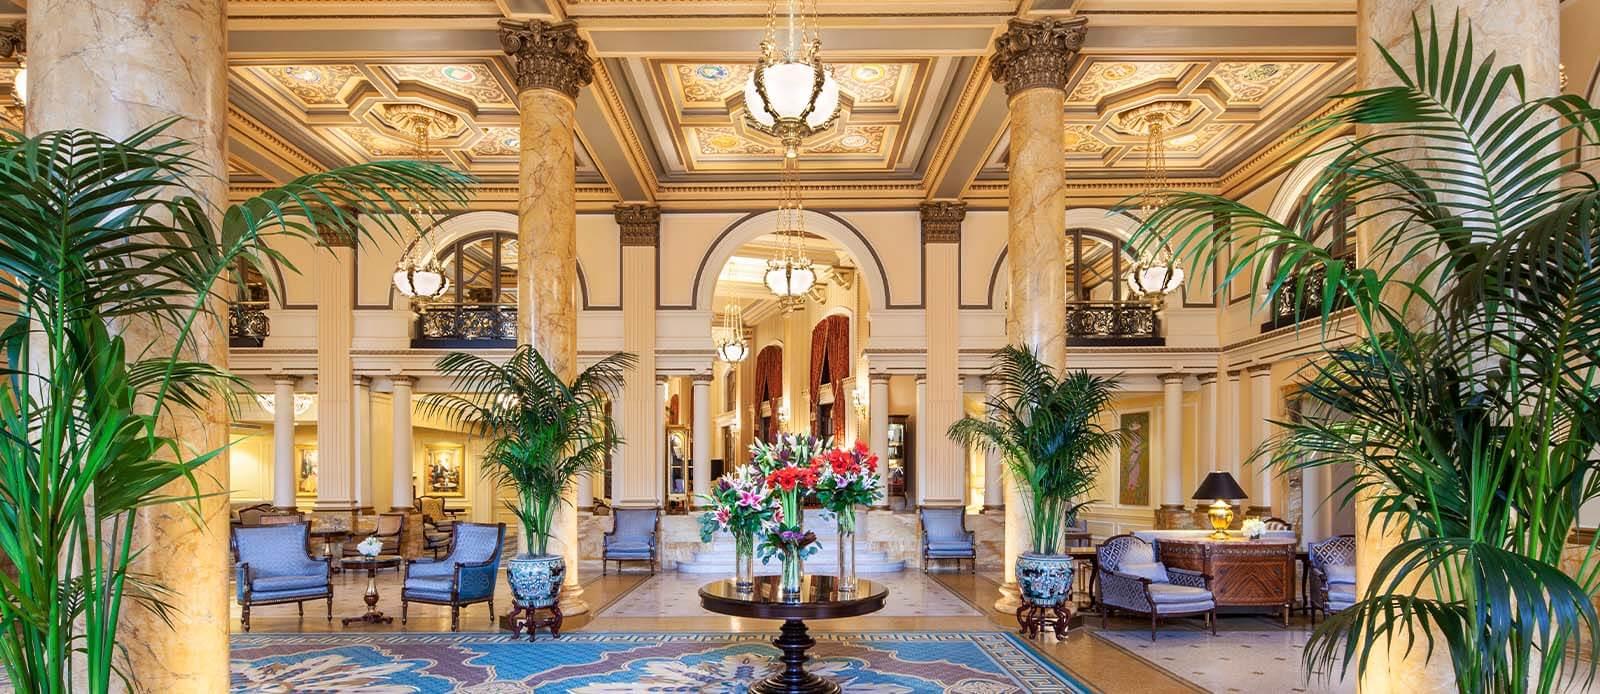 Discover the amazing interiors at the Willard InterContinental, Washington DC.